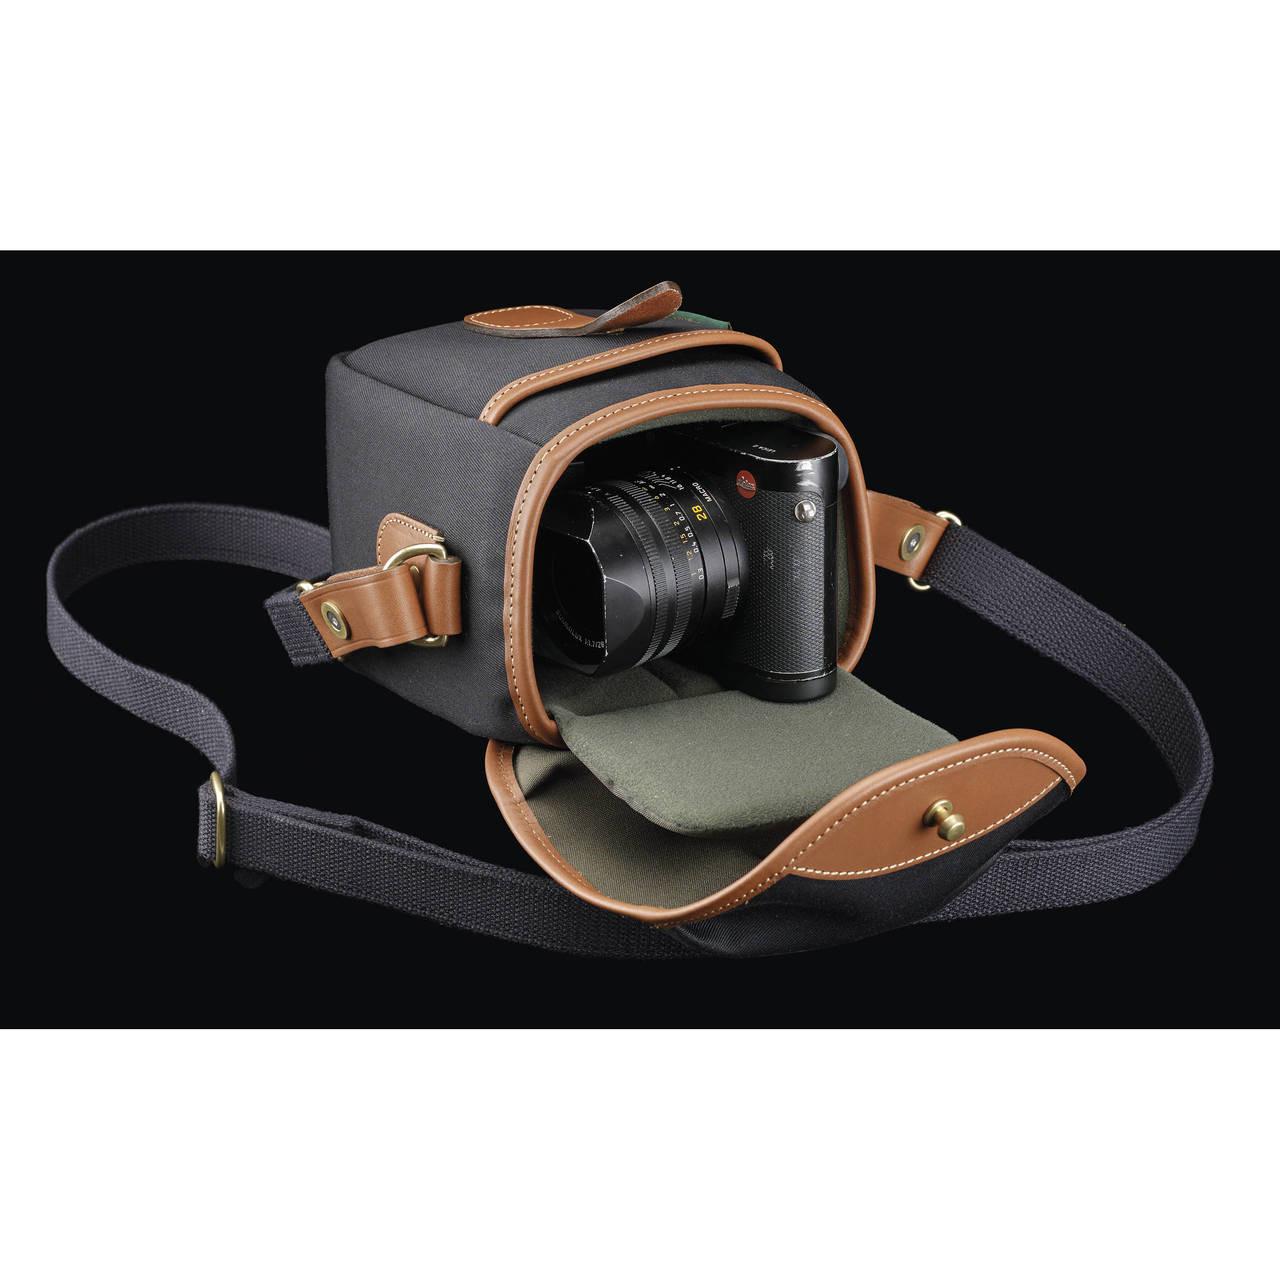 Billingham 72 Small Camera Bag Black Canvas Tan Leather Ace Photo